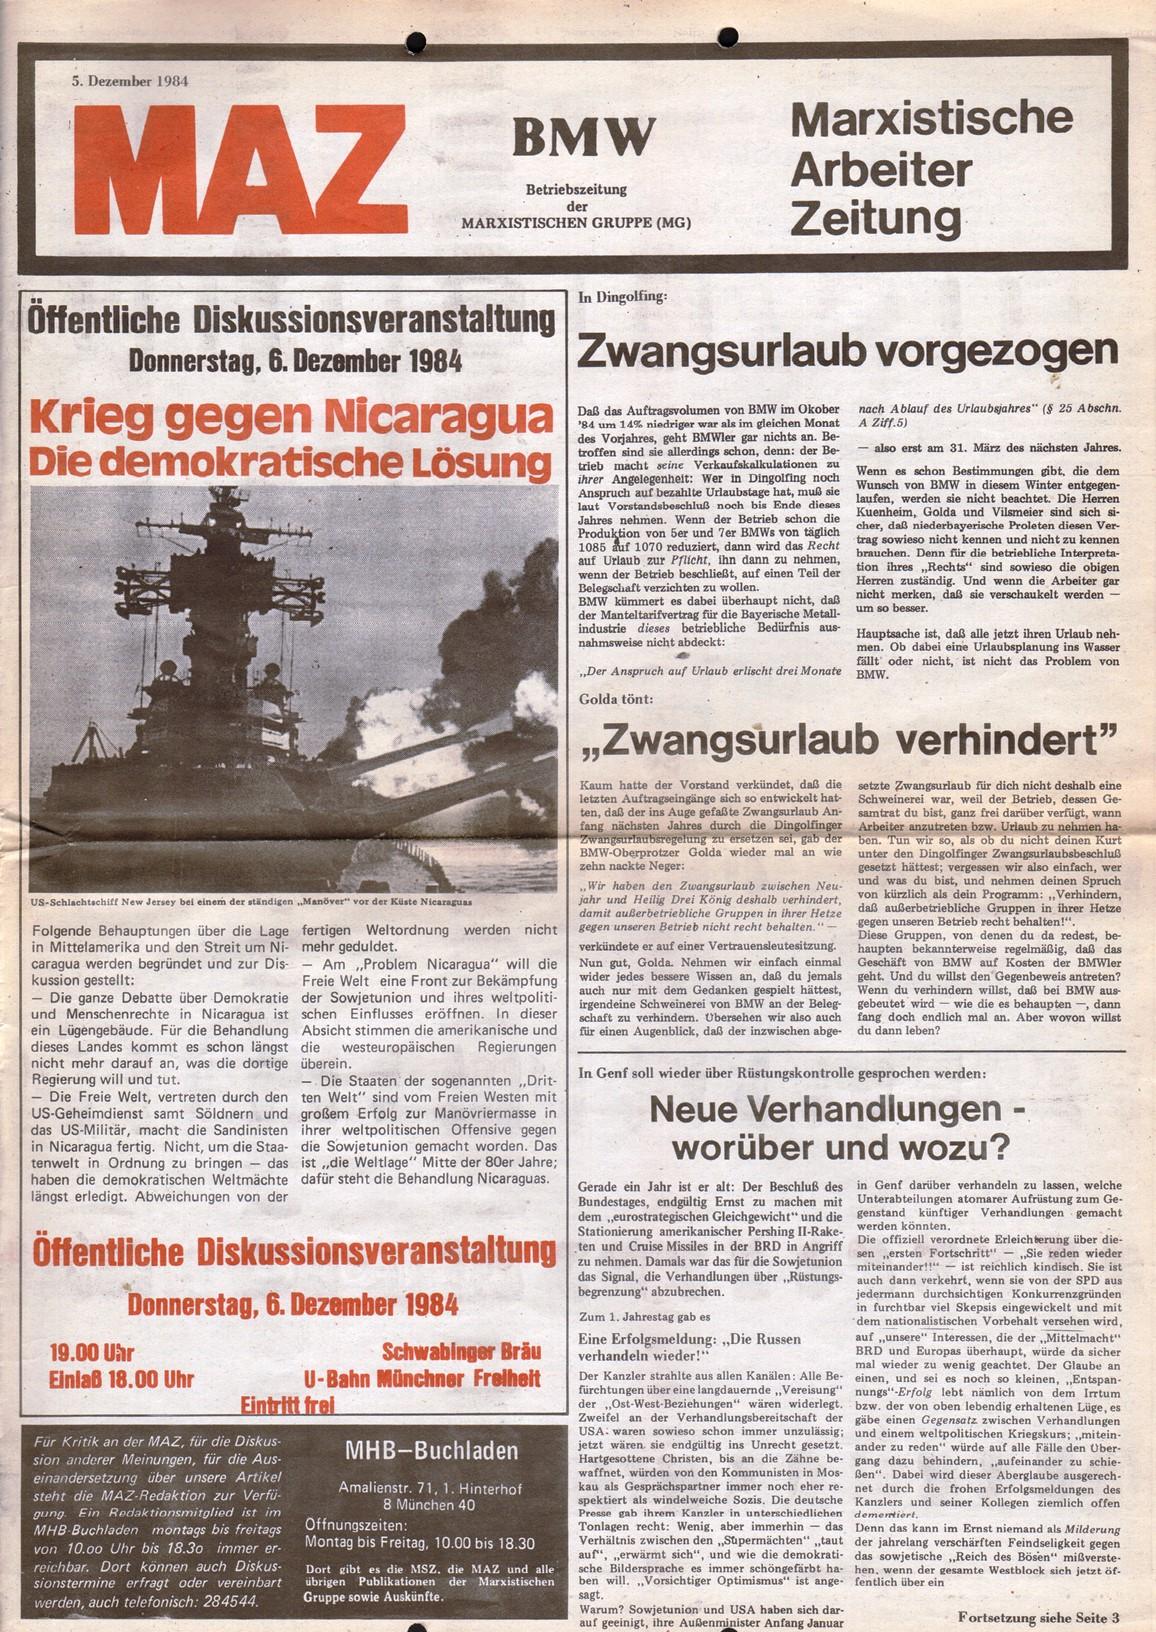 Muenchen_MG_MAZ_BMW_19841205_01